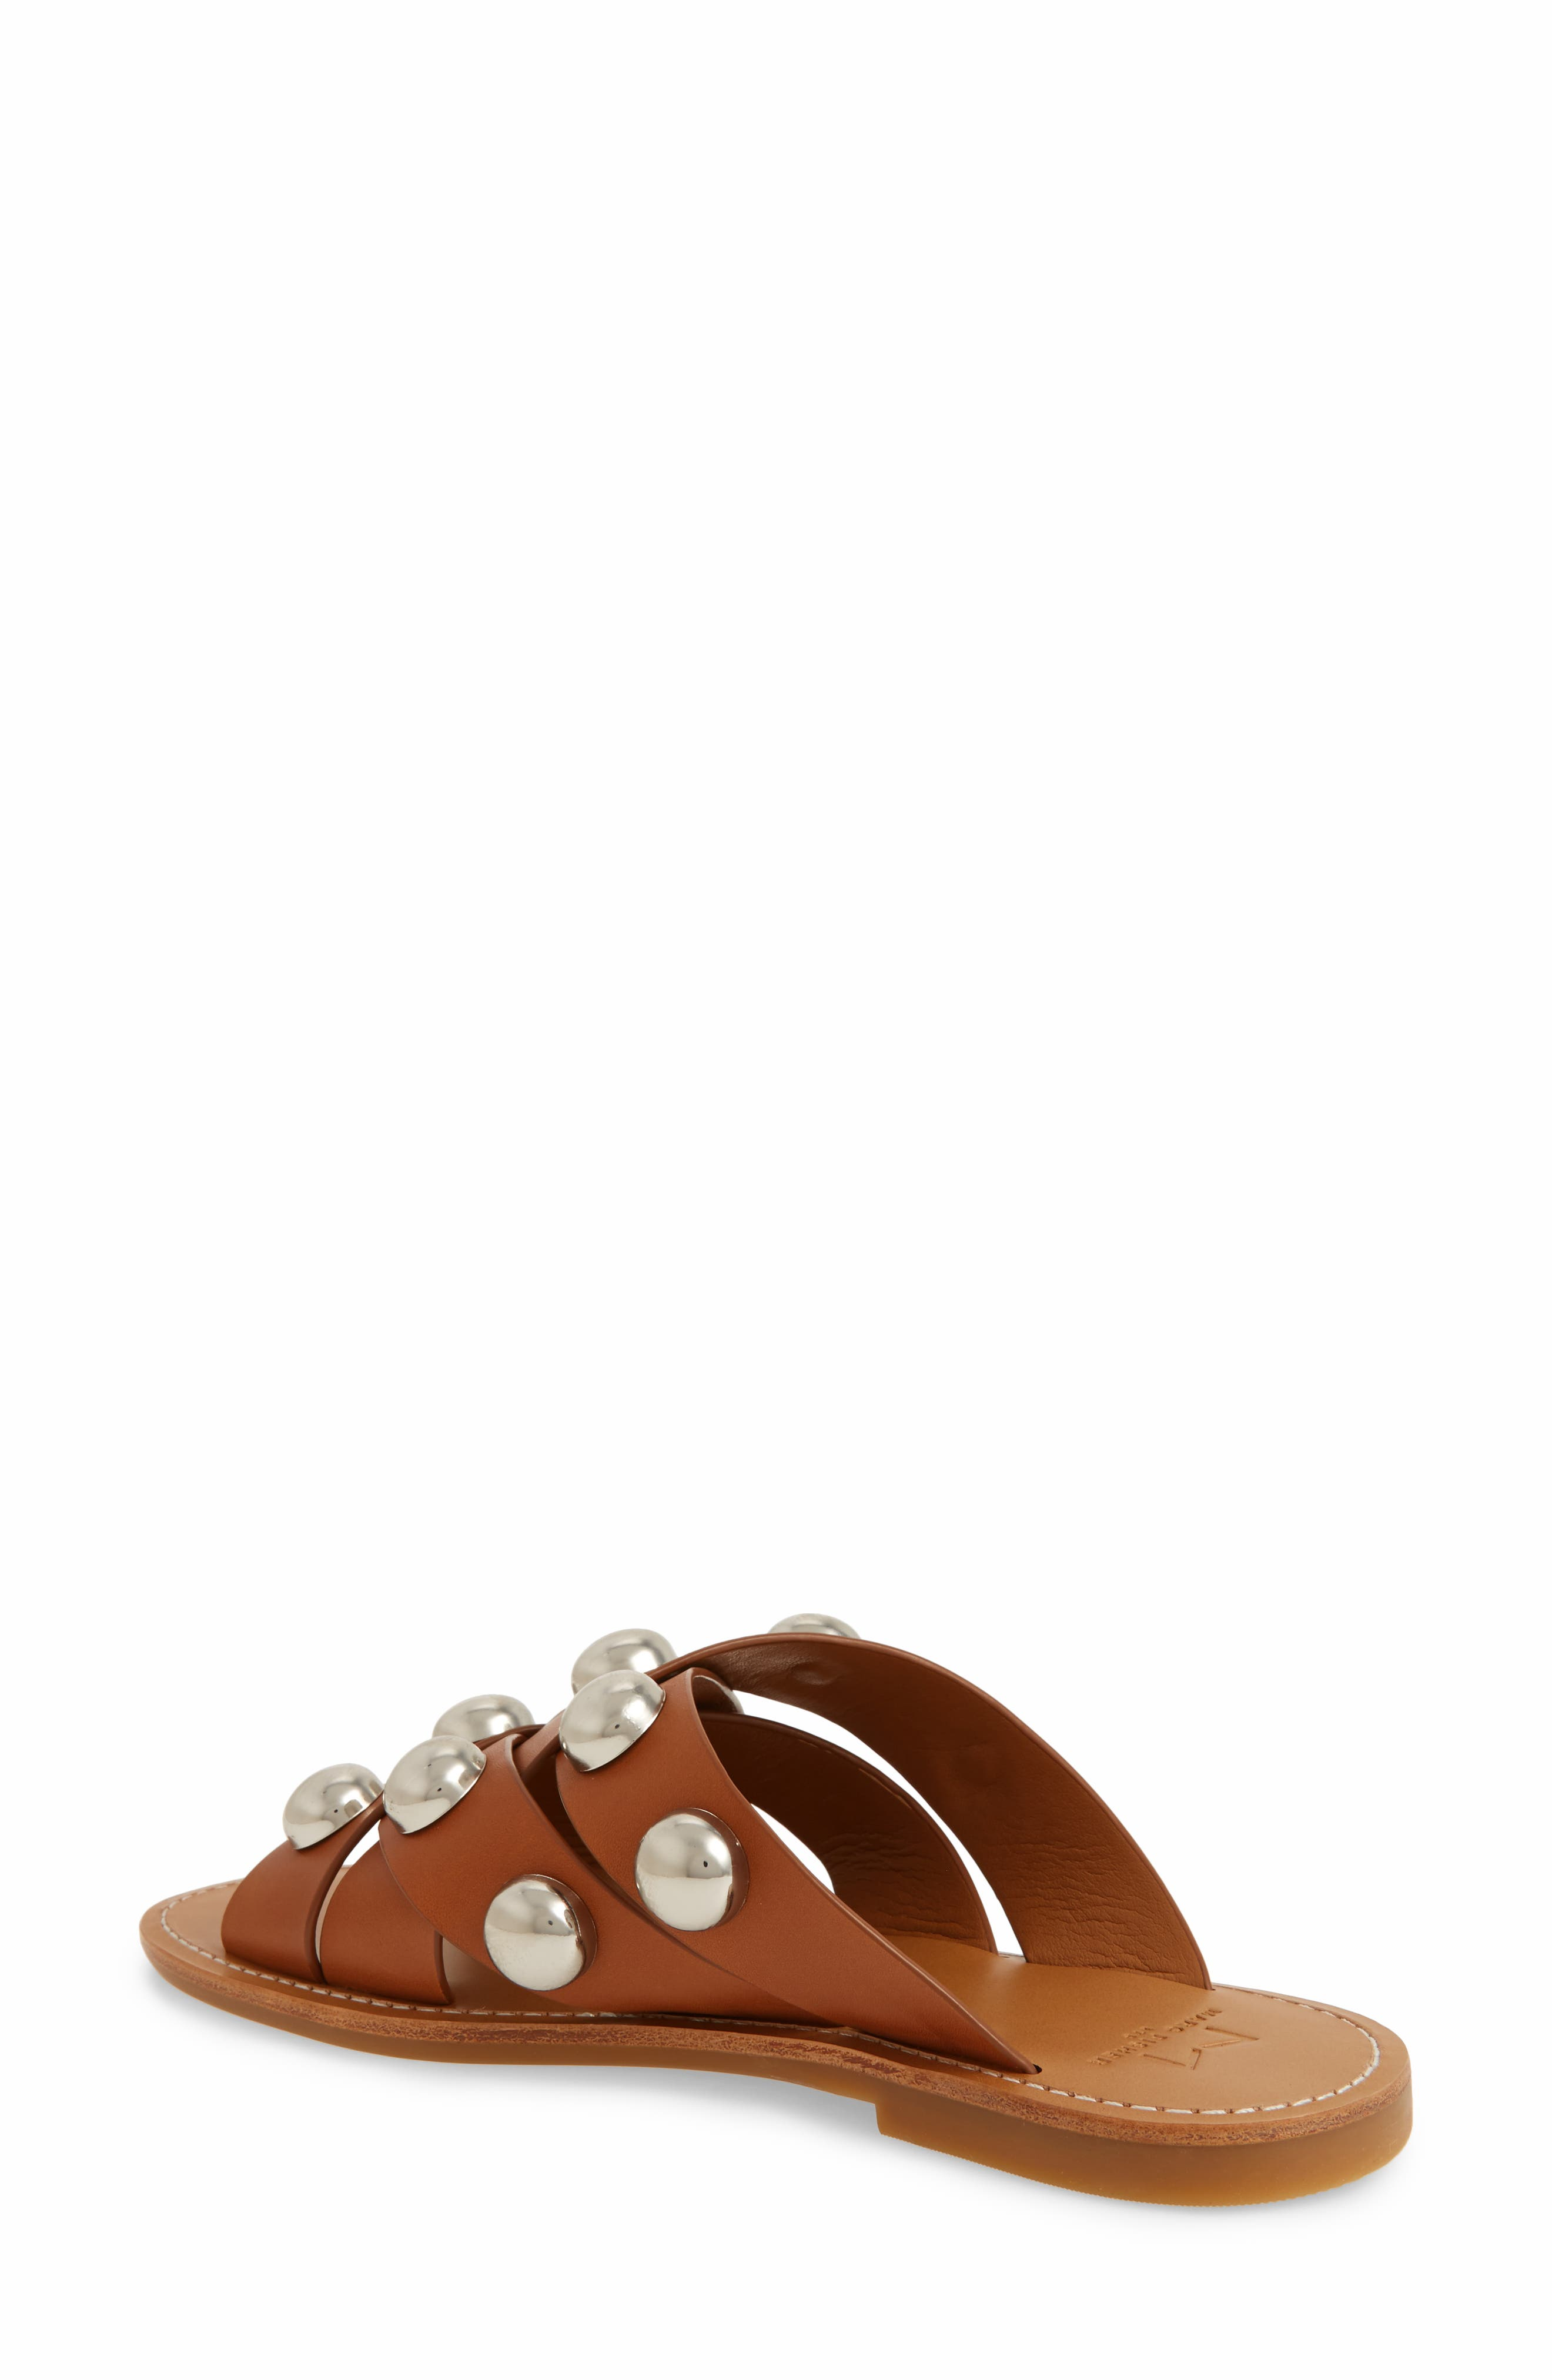 Raidan Studded Sandal,                             Alternate thumbnail 8, color,